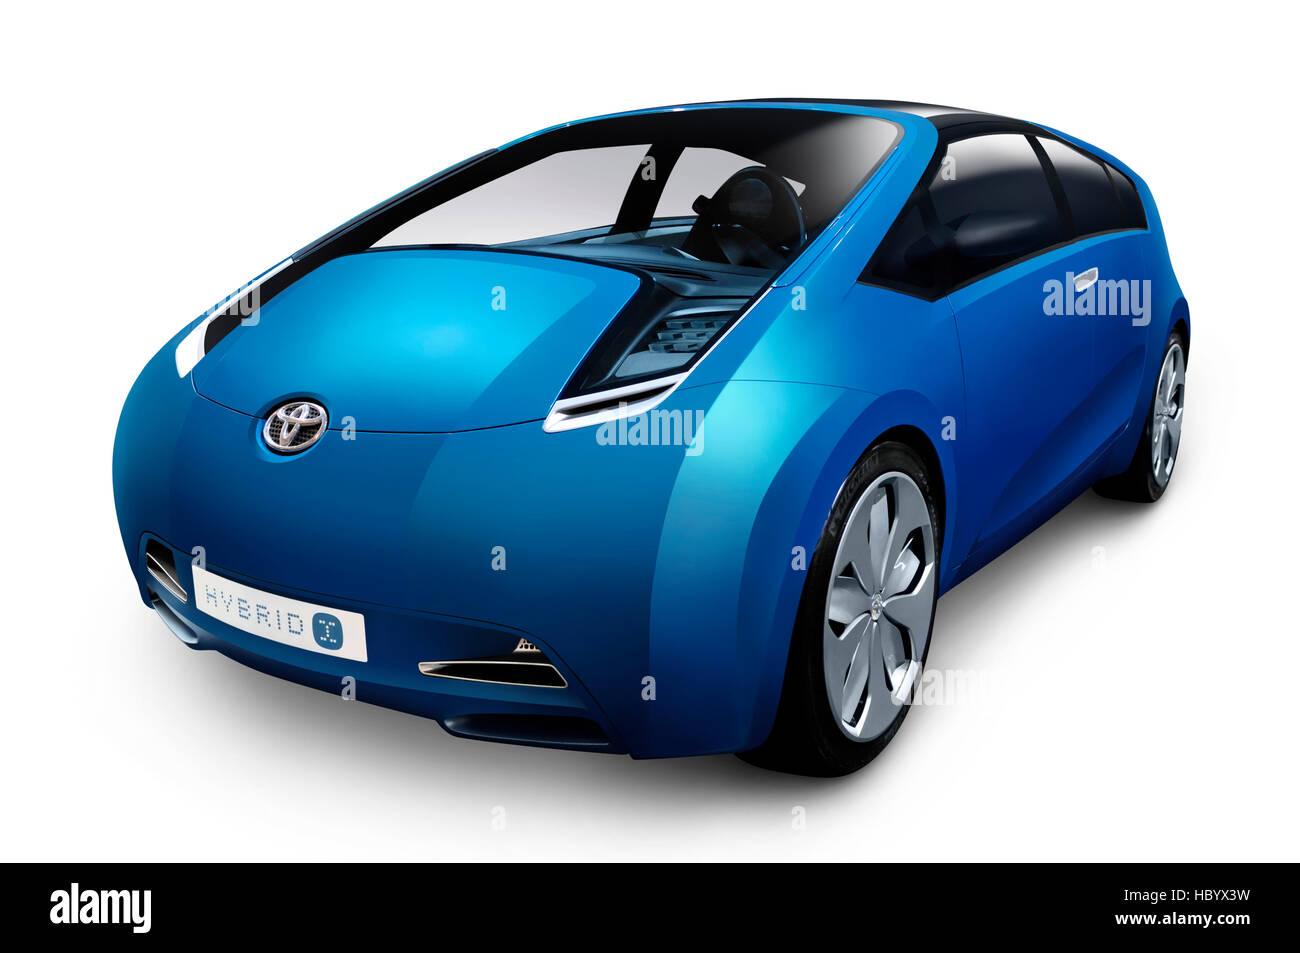 Toyota Hybrid-X concept hybrid car - Stock Image